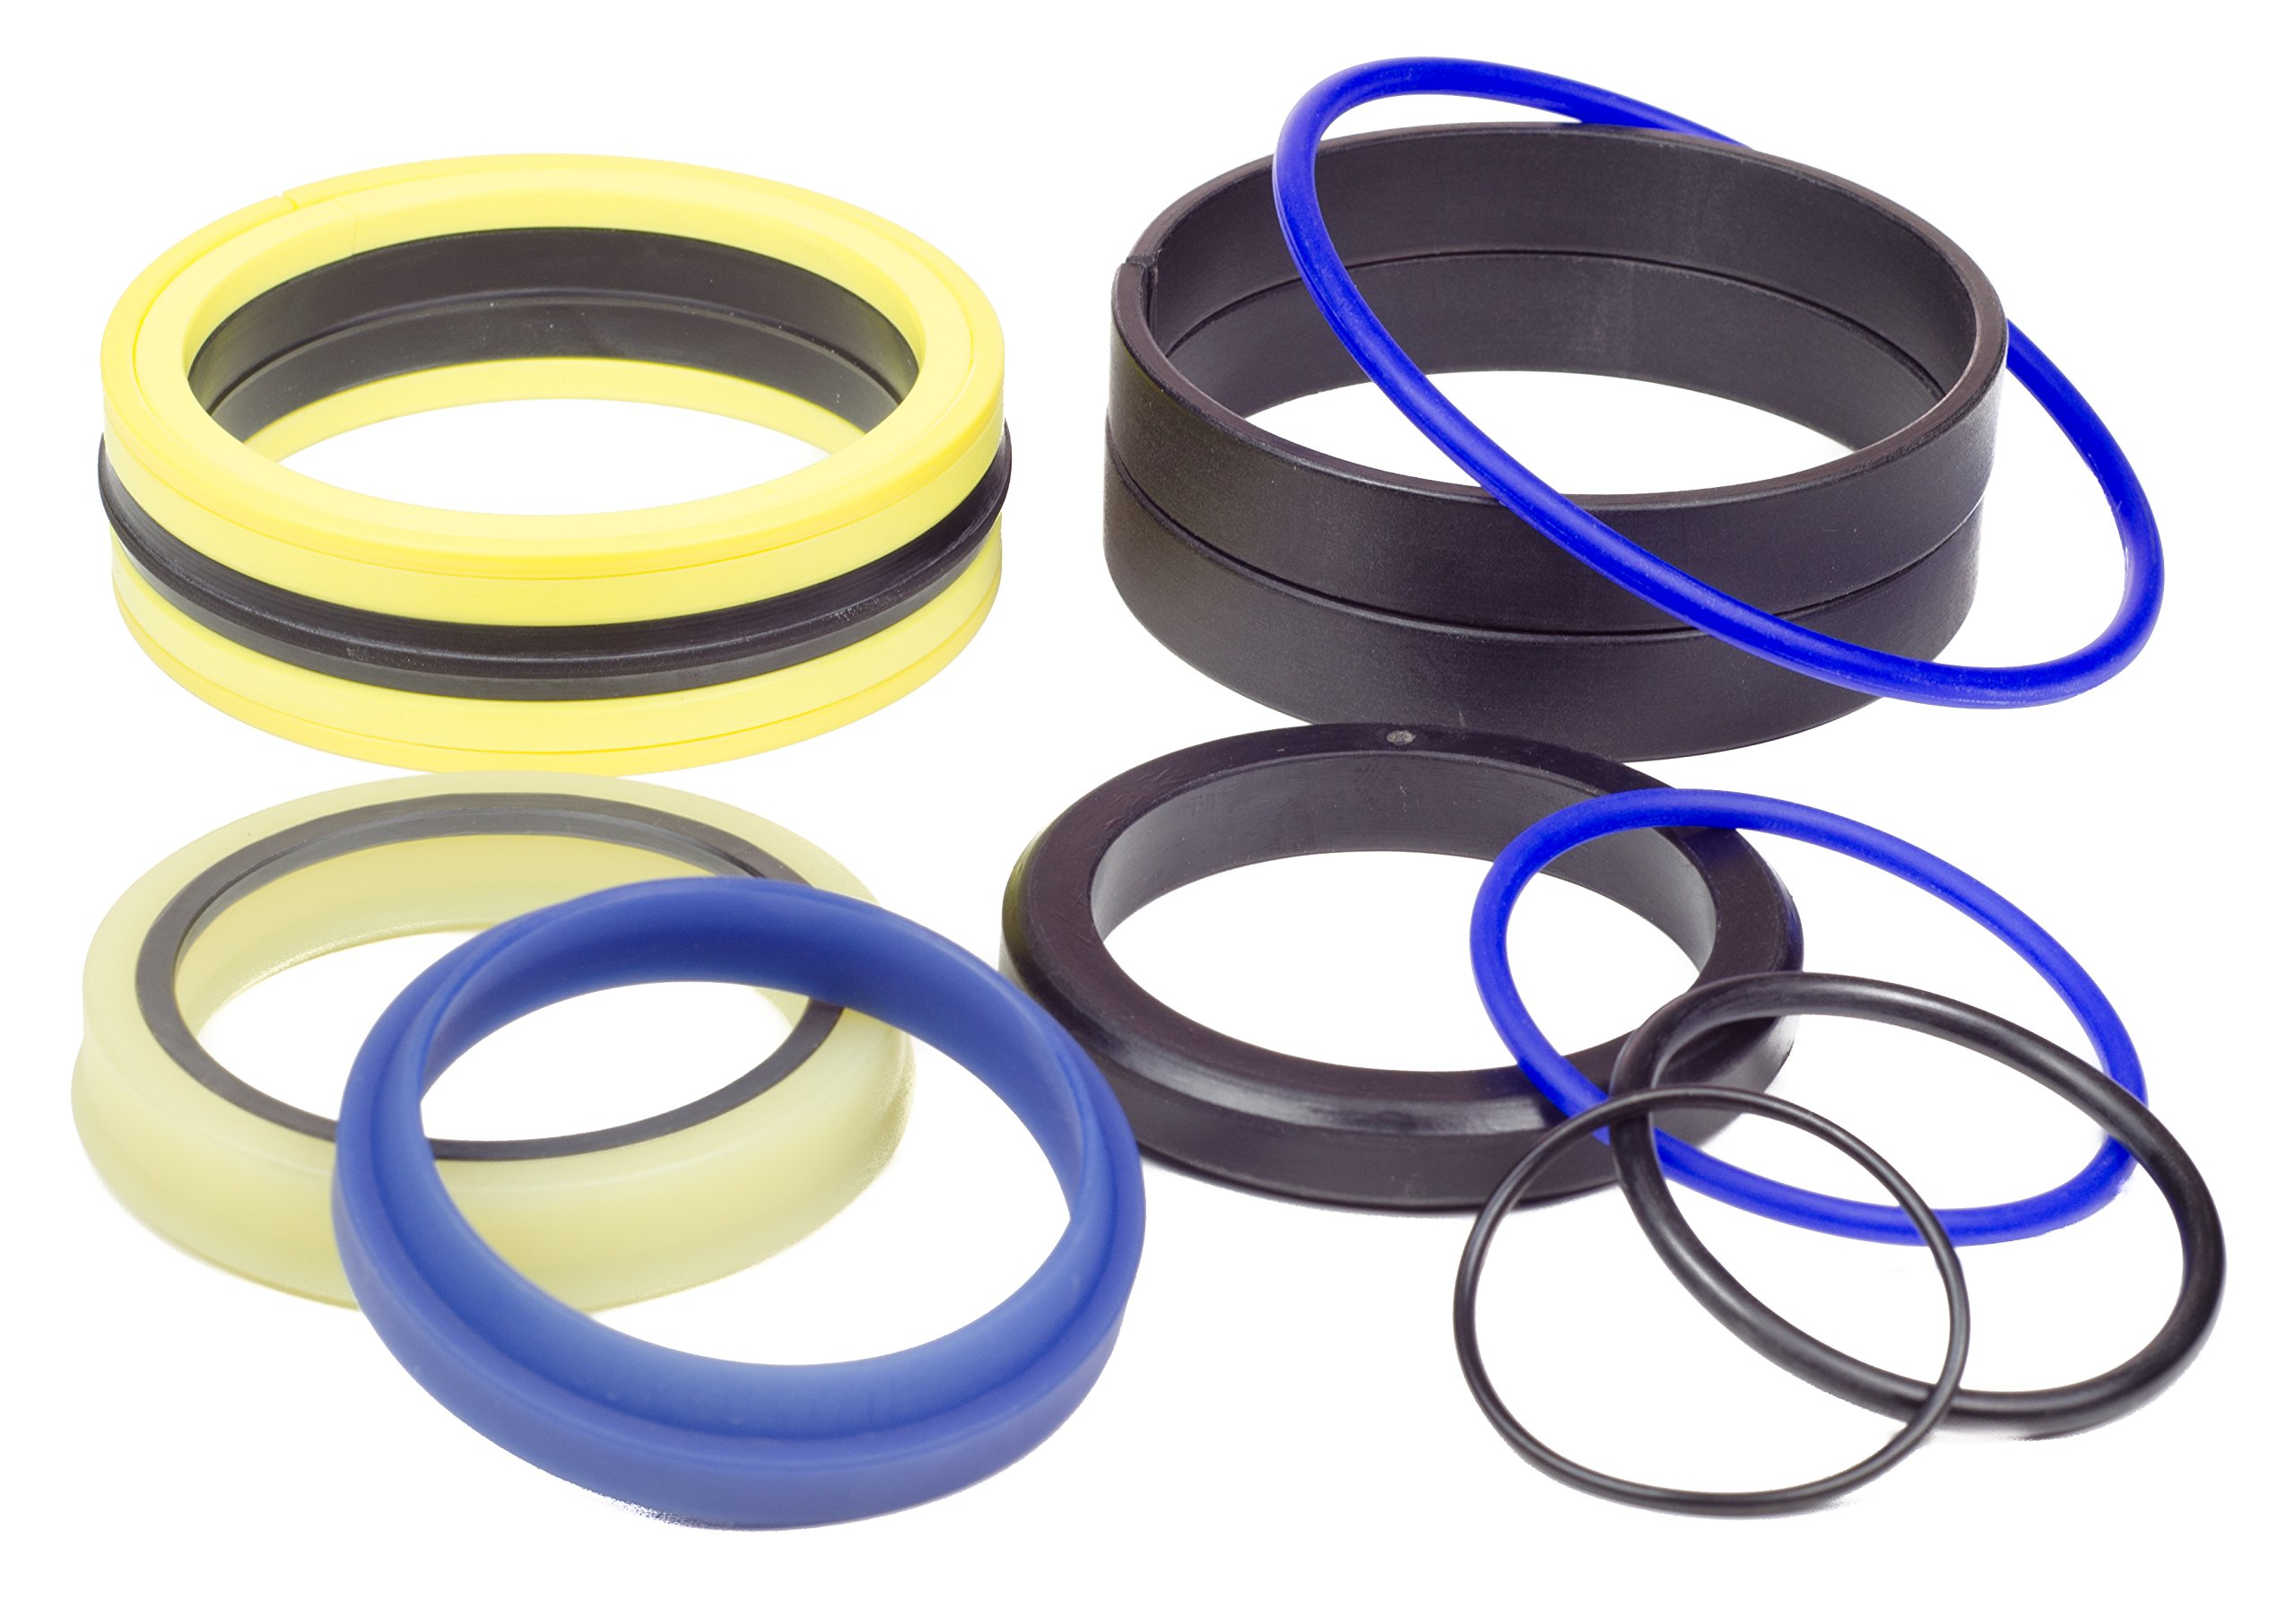 JCB 991-00123 Aftermarket Hydraulic Cylinder Seal Kit by Kit King USA